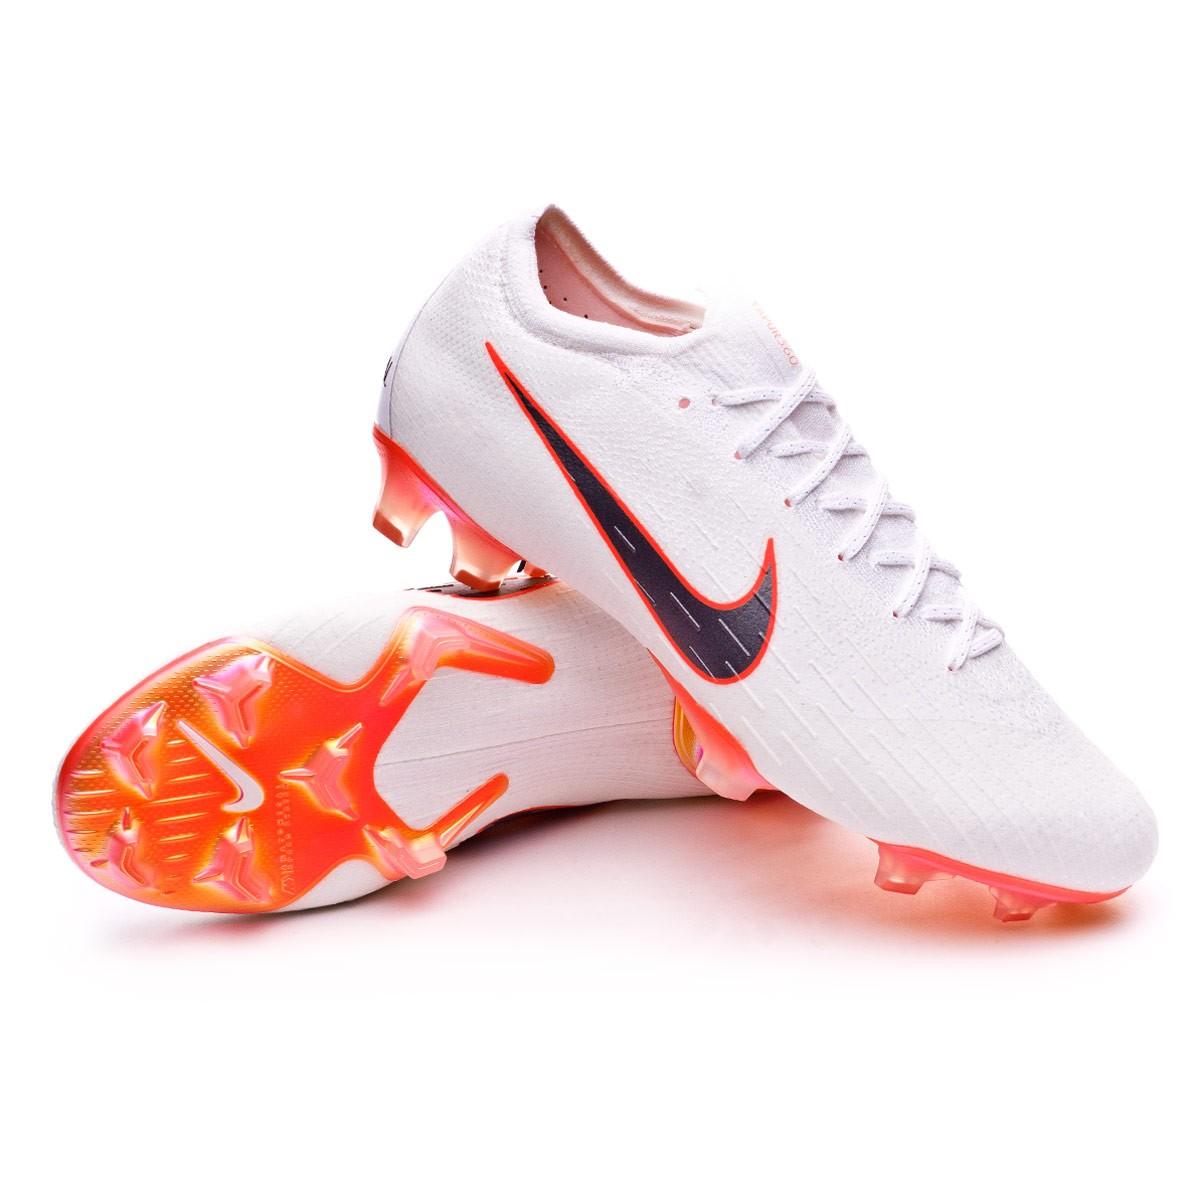 Nike mercurial vapor XII elite